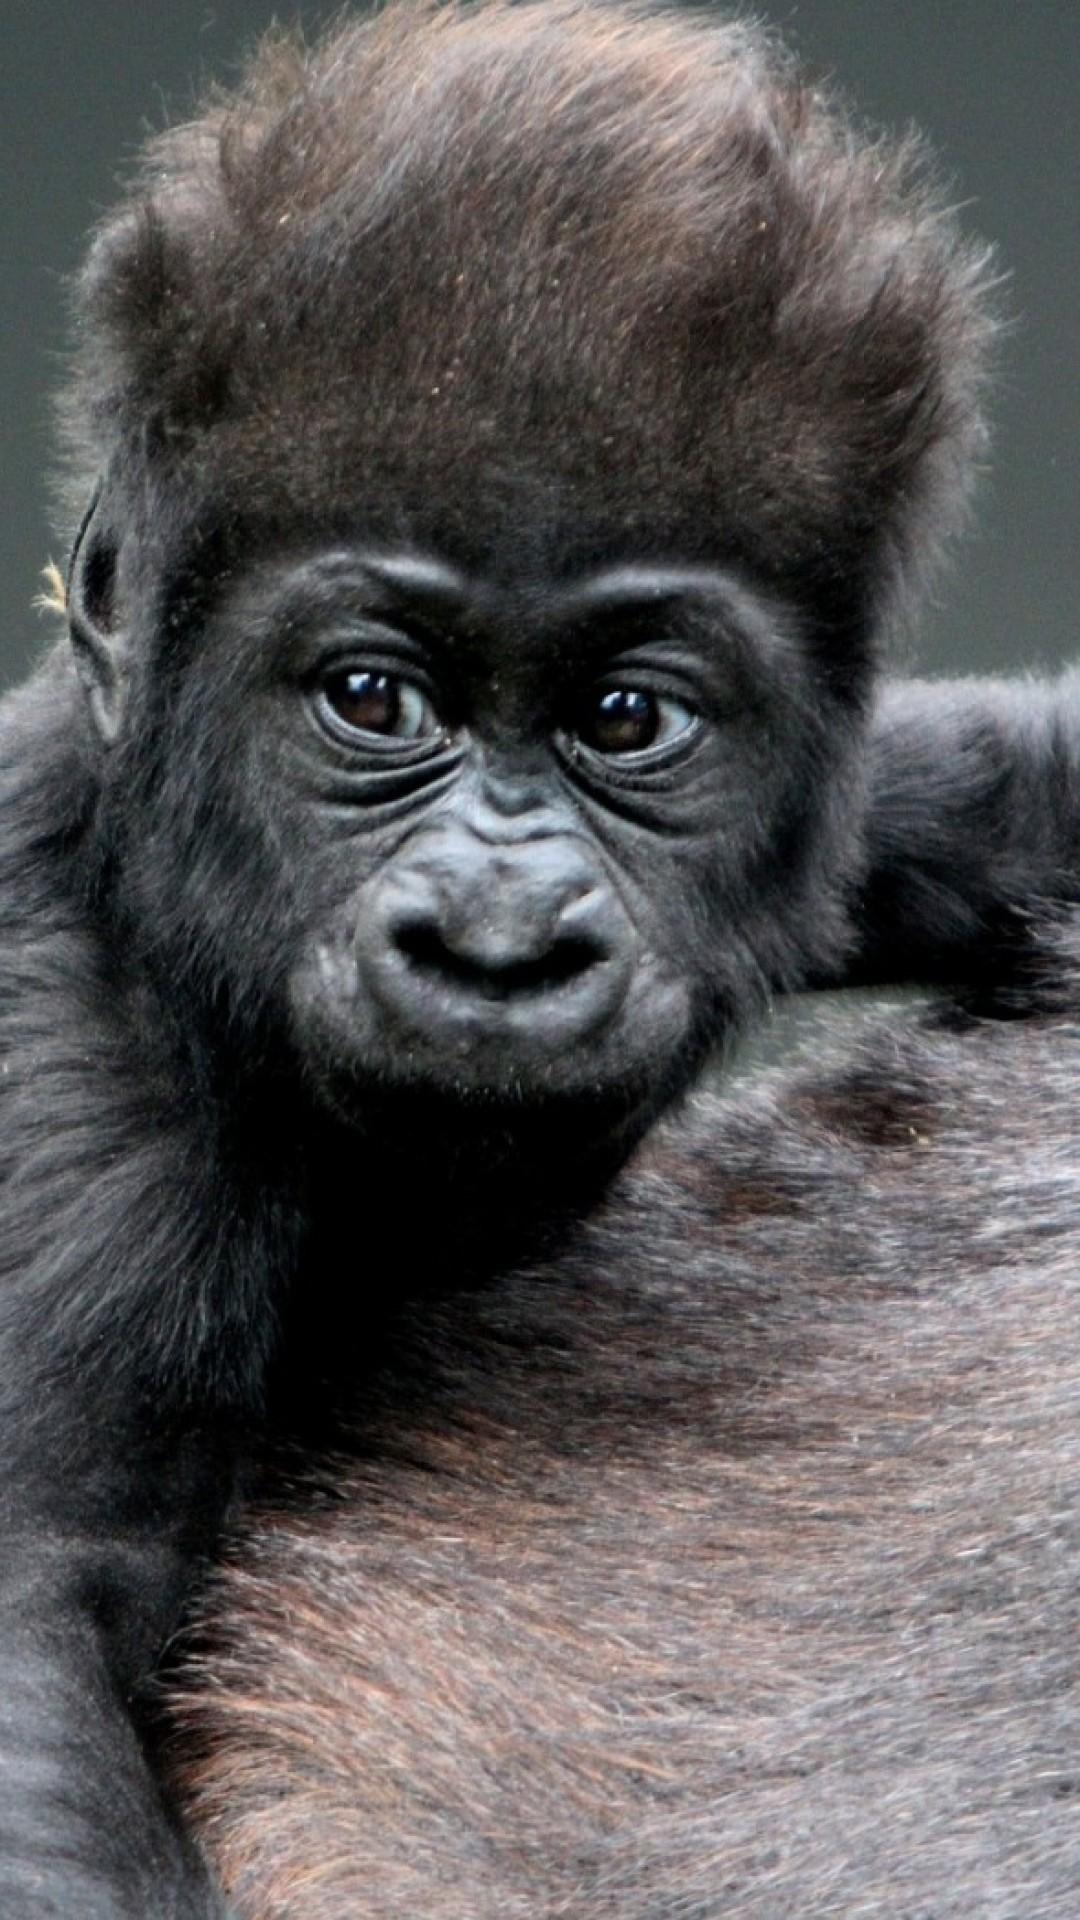 Wallpaper monkey, baby, gorilla, hair